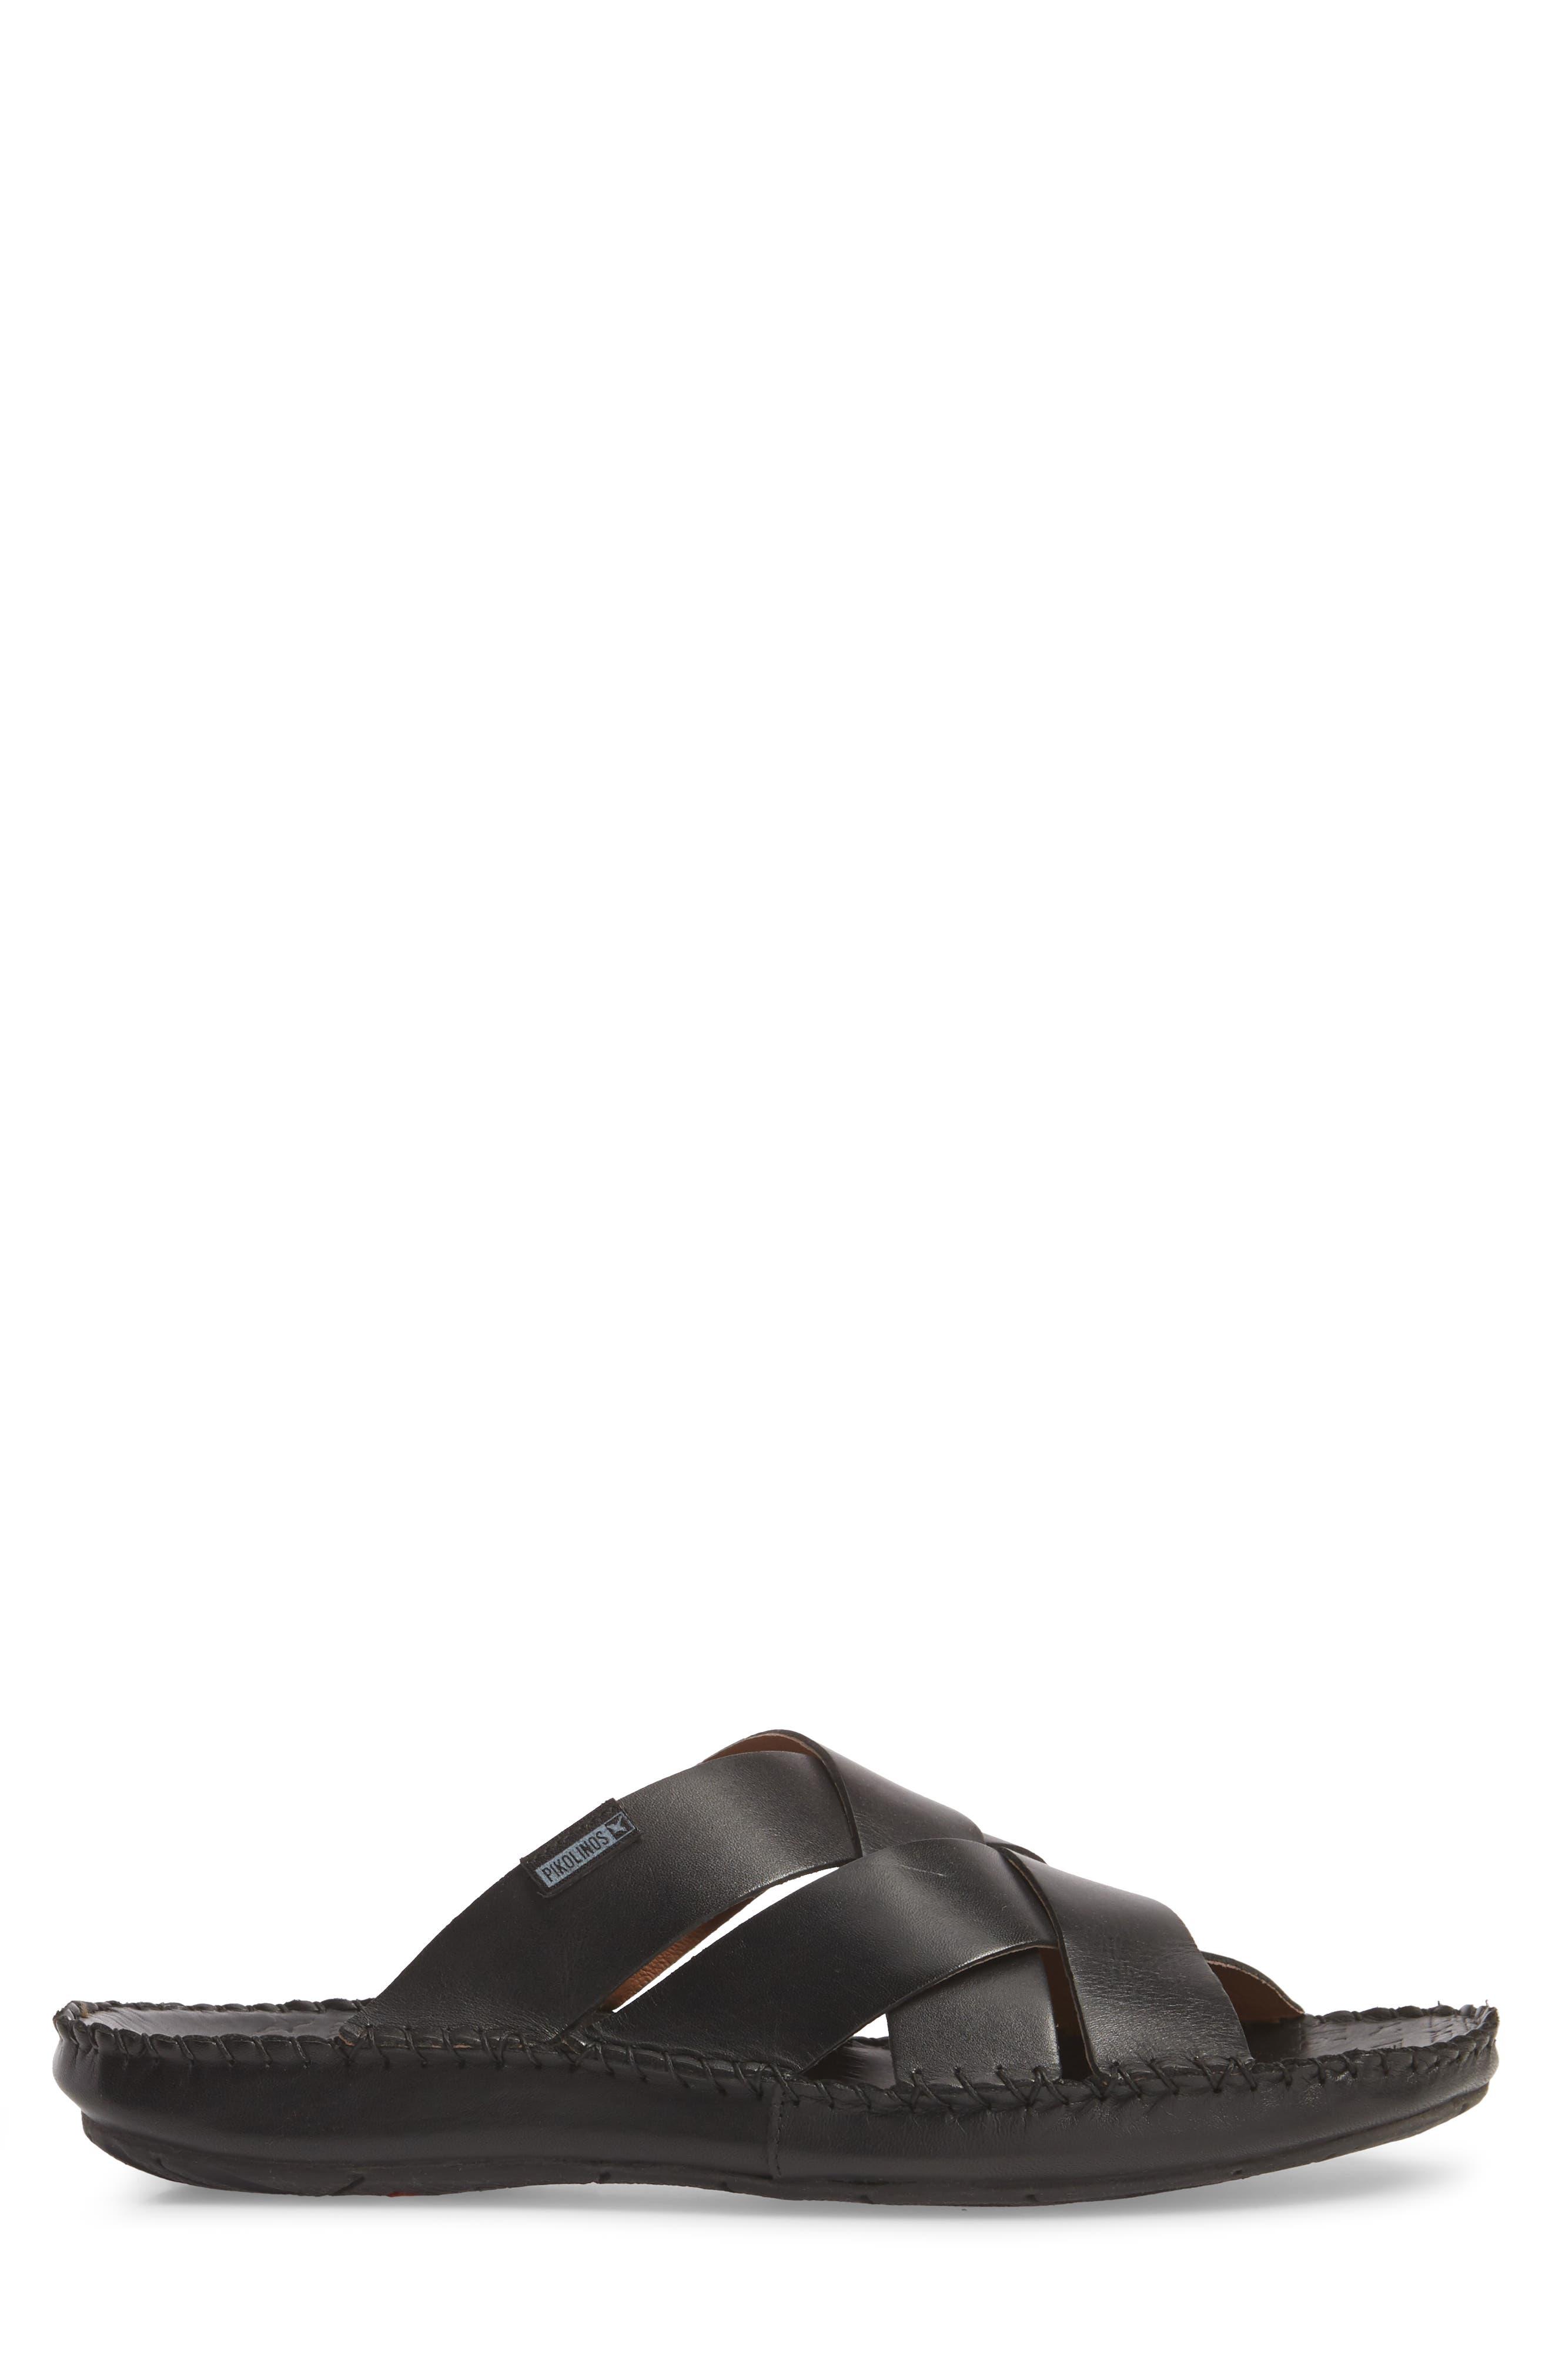 'Tarifa' Slide Sandal,                             Alternate thumbnail 3, color,                             Black Leather